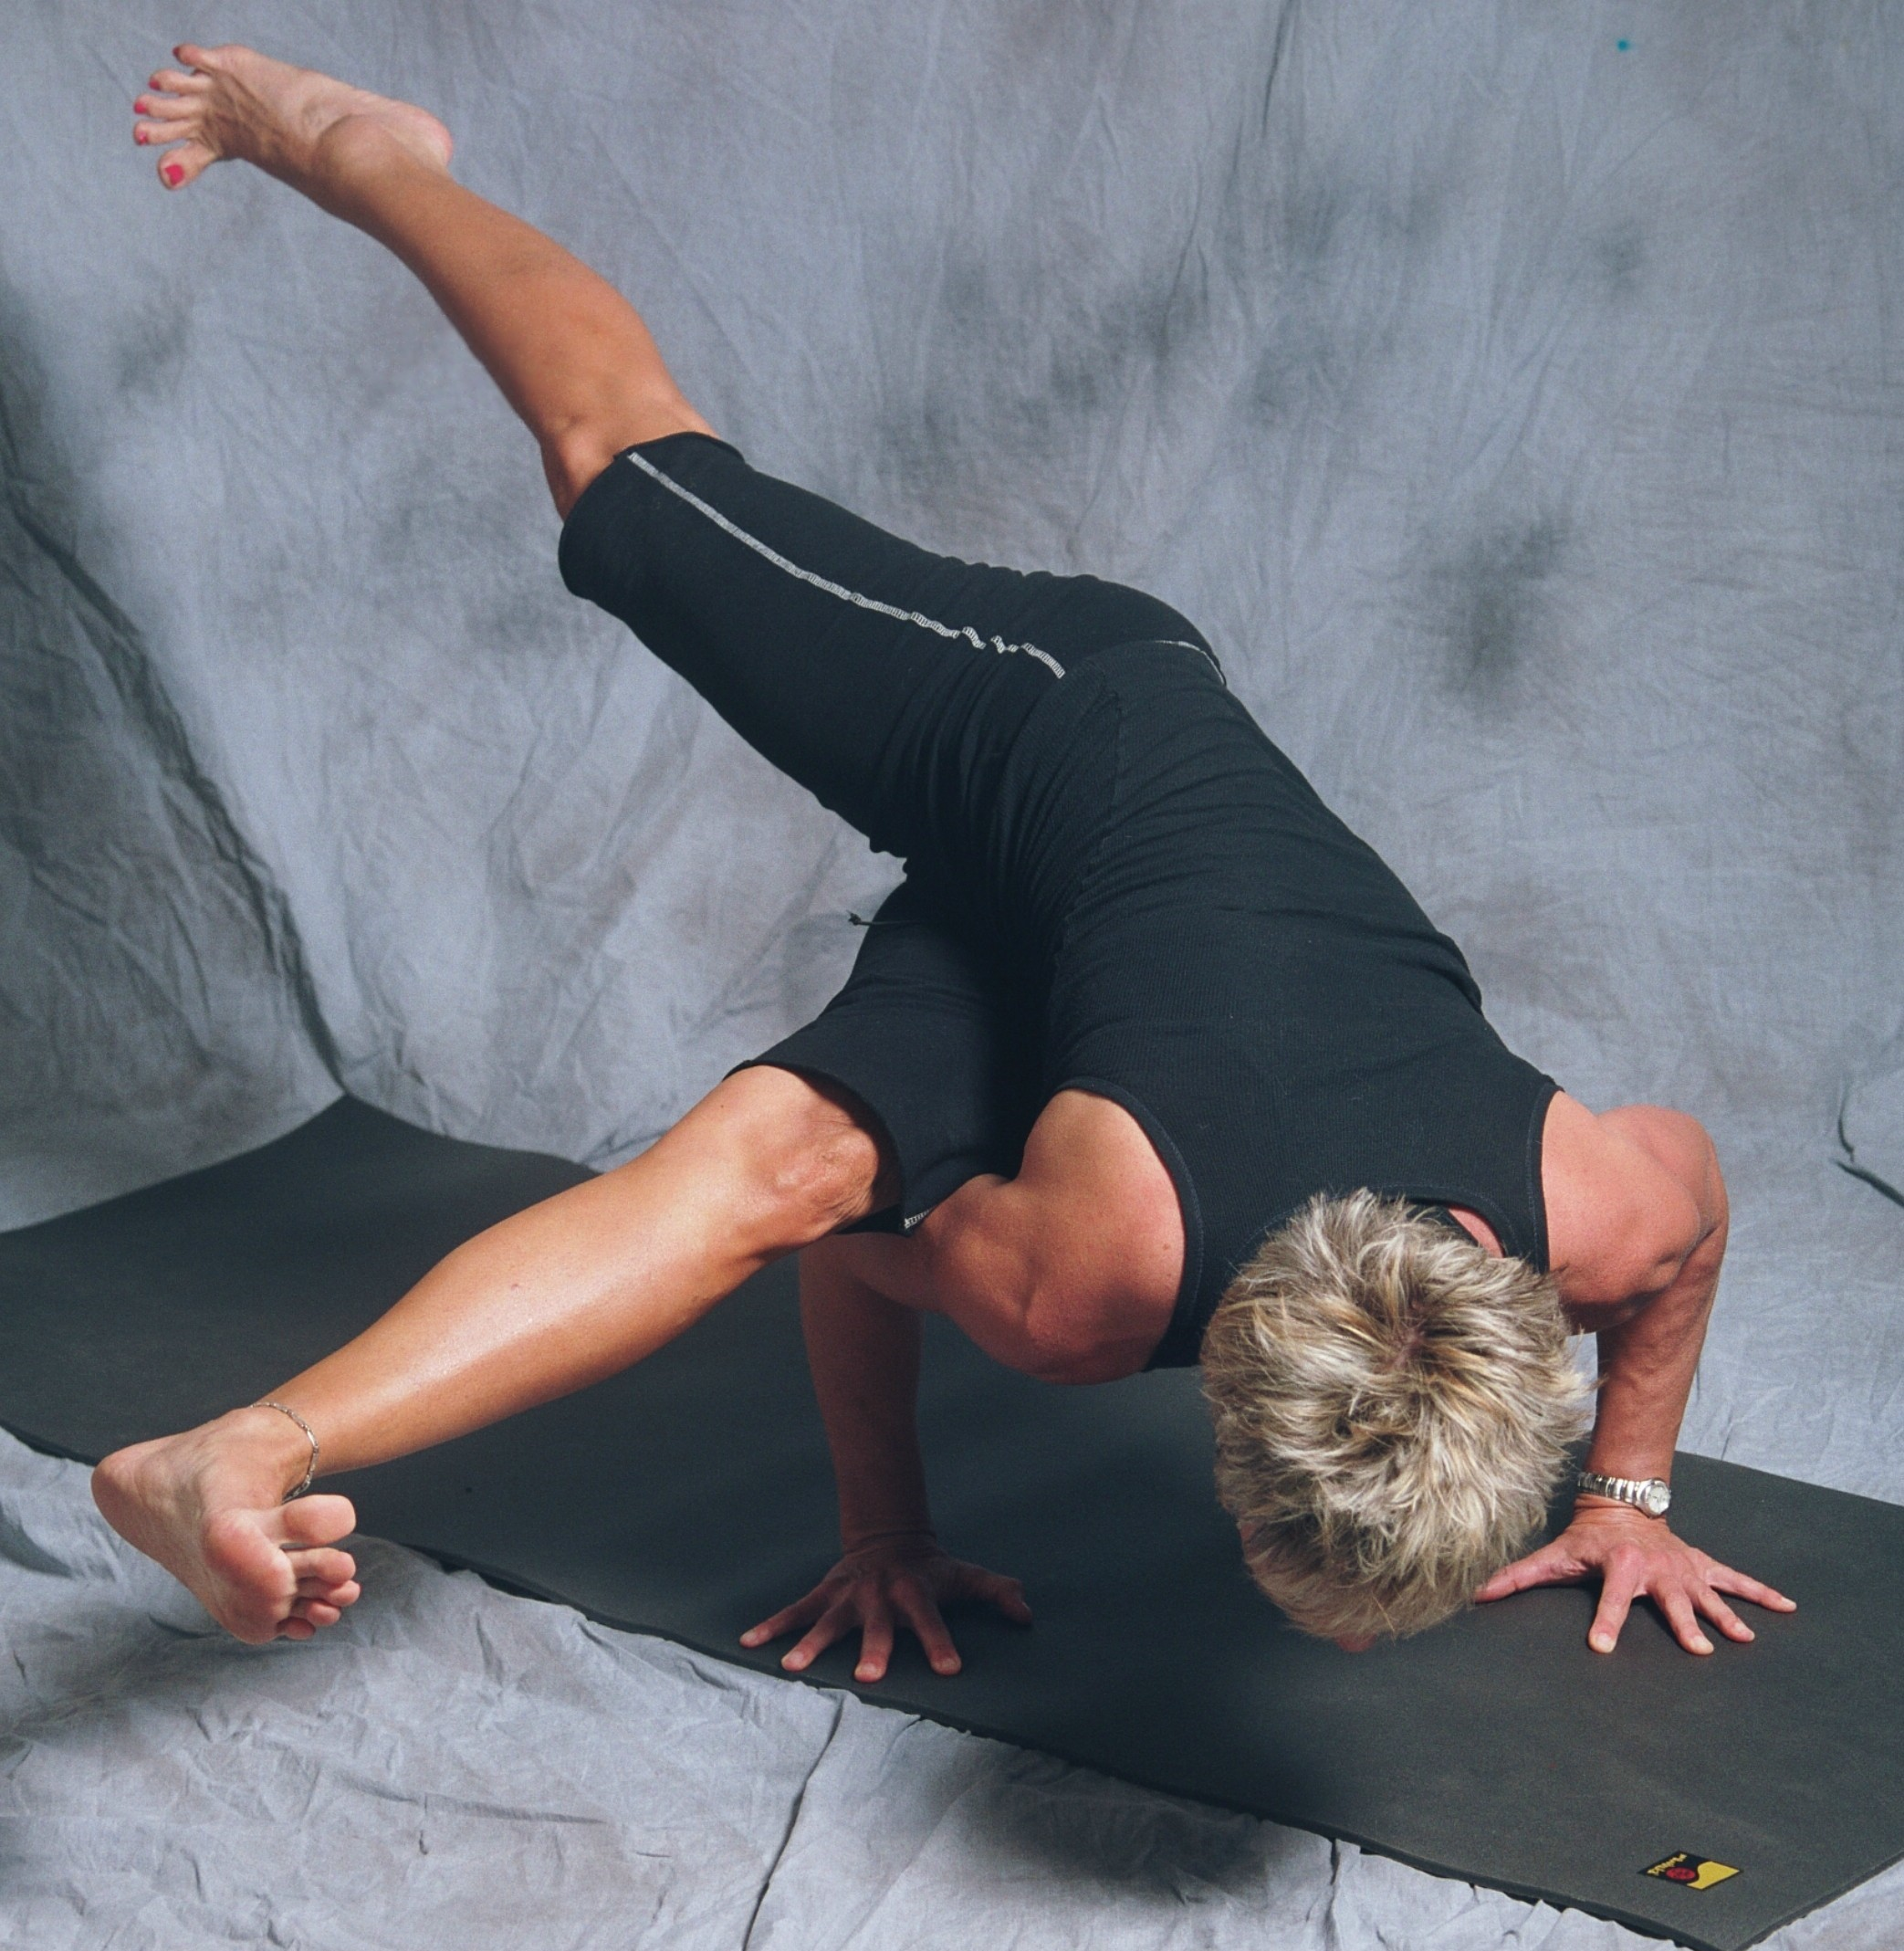 Shanti-Kitti-Yoga-Sophia-arm-balance